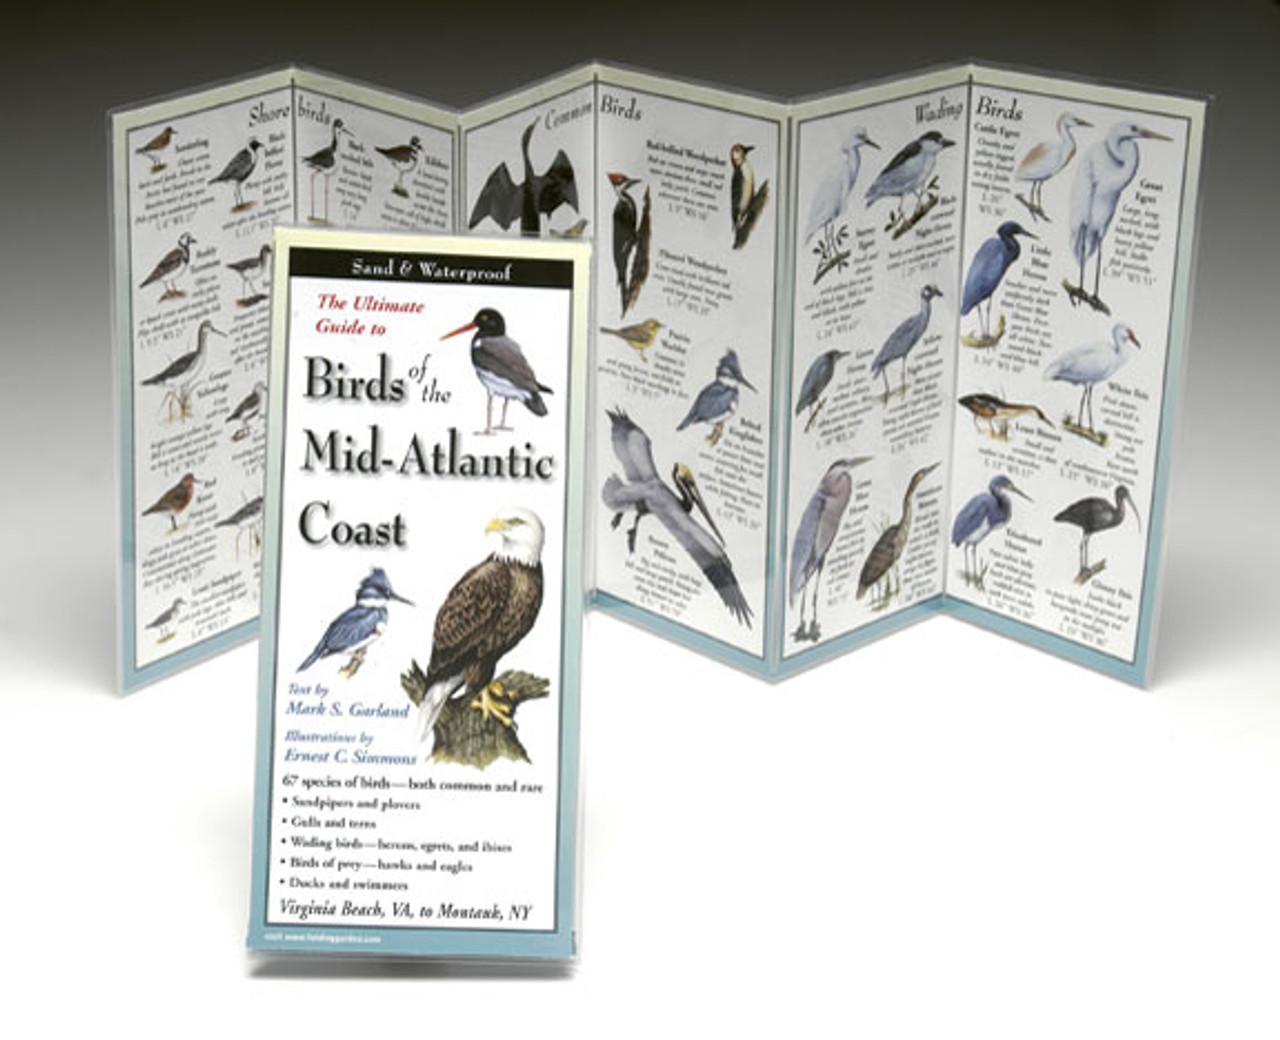 Birds of the Mid-Atlantic Coast